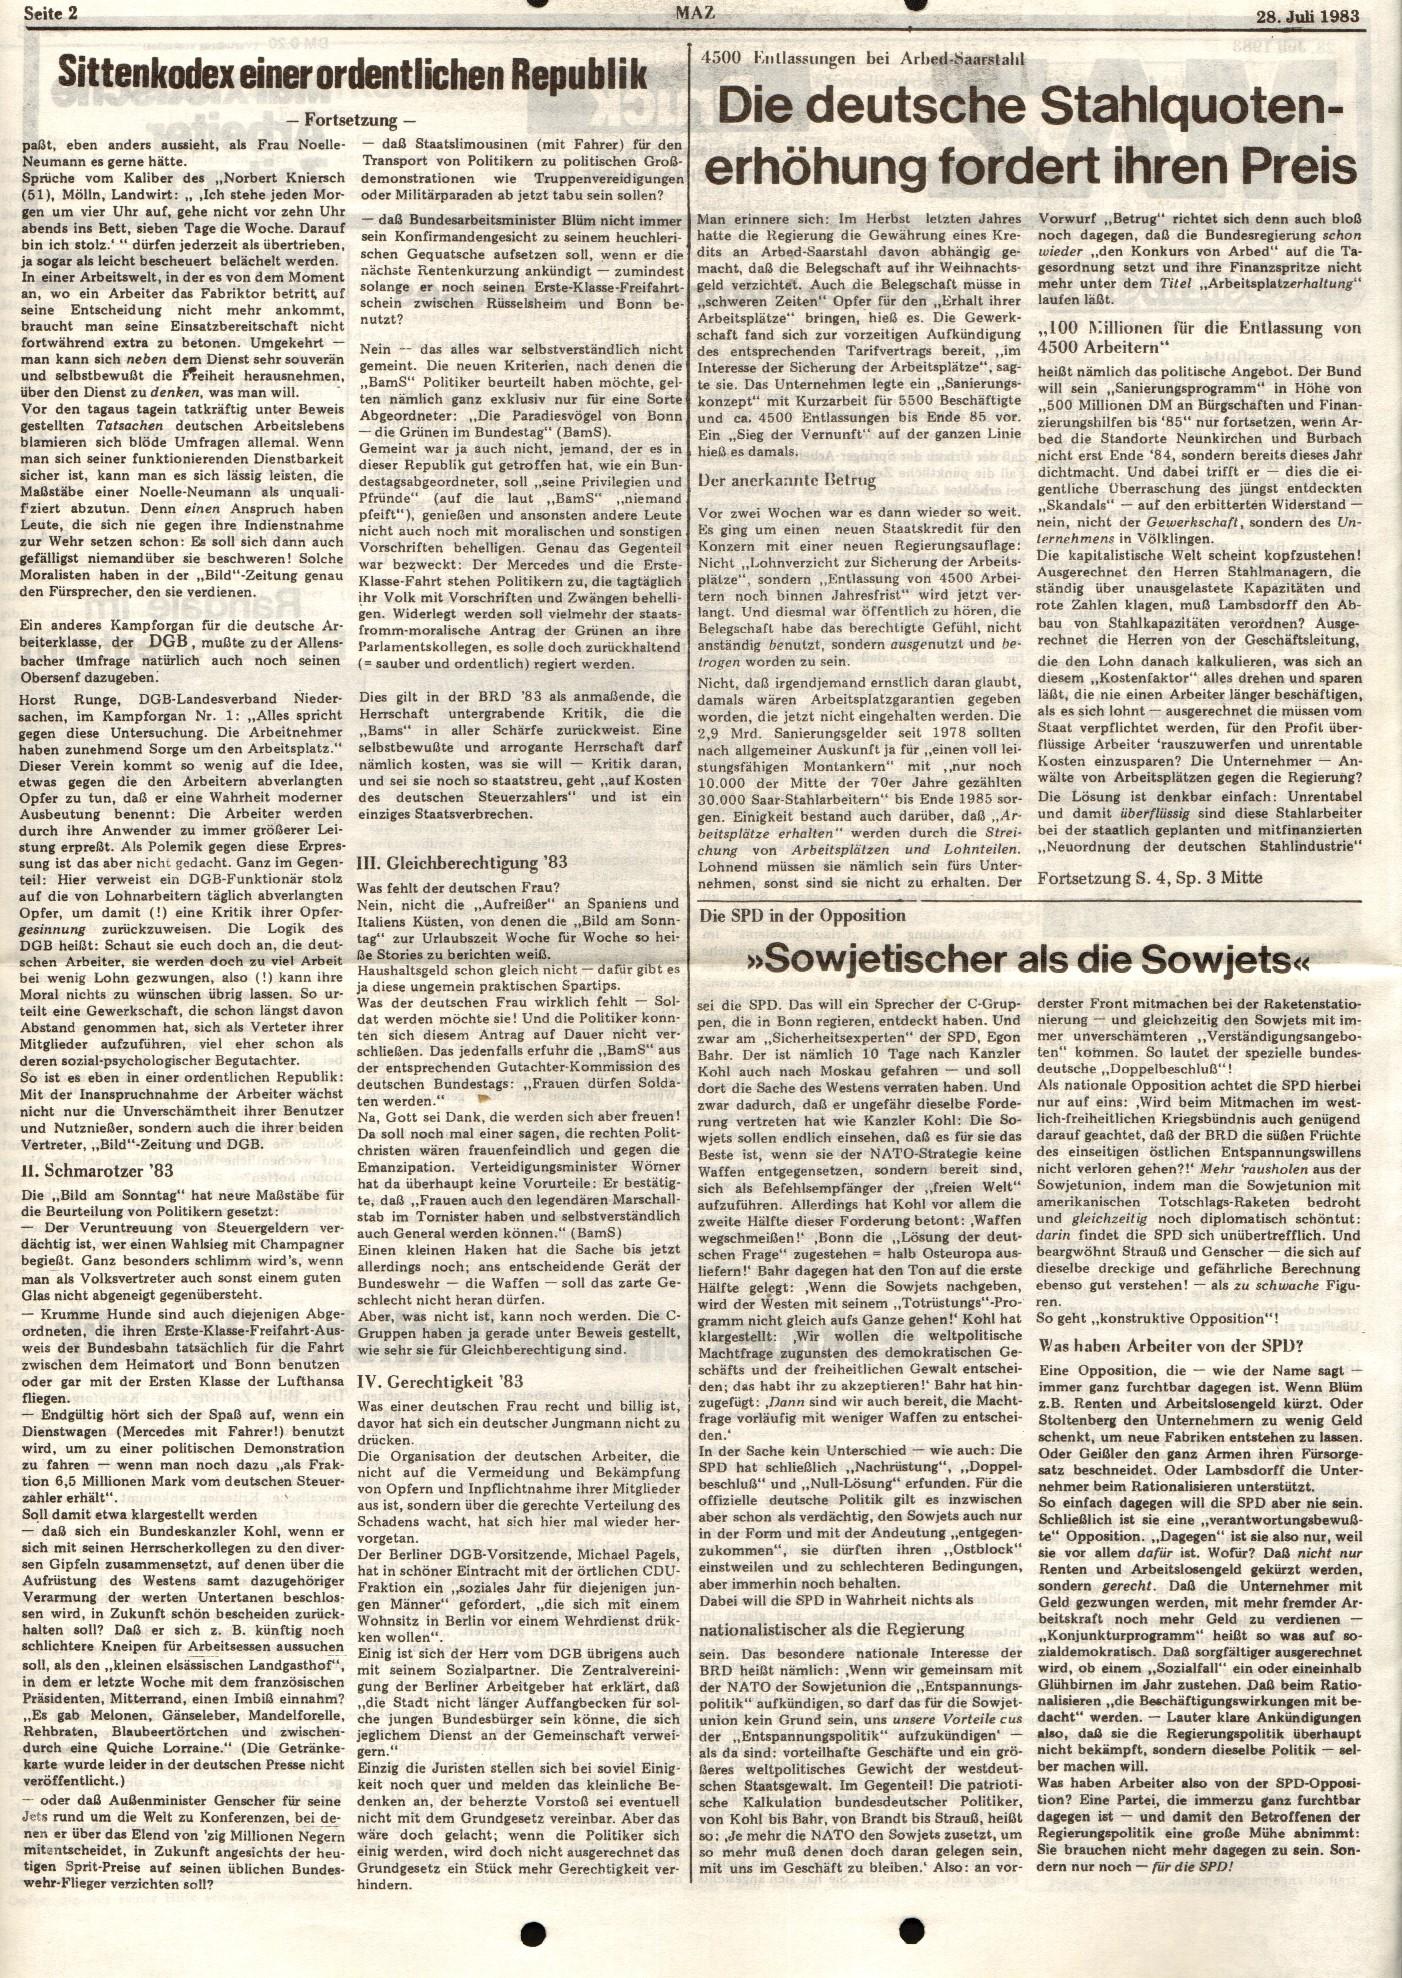 Hamburg_MG_MAZ_Druck_19830728_02